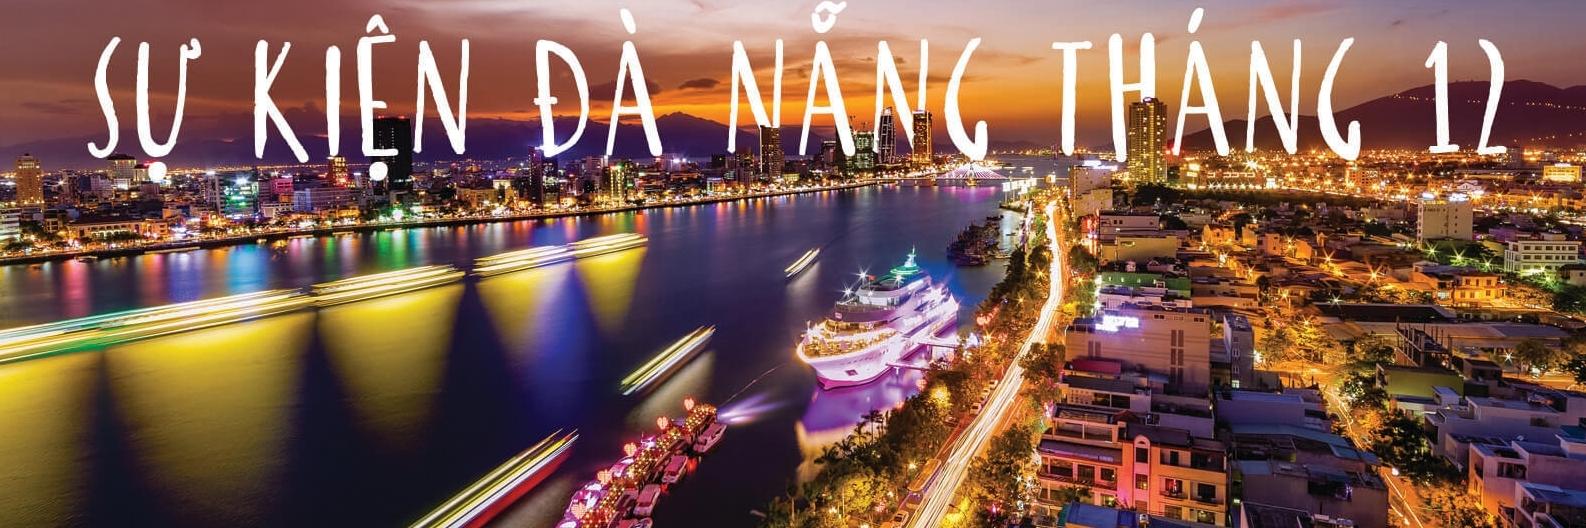 https://gody.vn/blog/quynhchi191020164143/post/nhung-dieu-hap-dan-chi-co-khi-du-lich-da-nang-trong-thang-12-6024